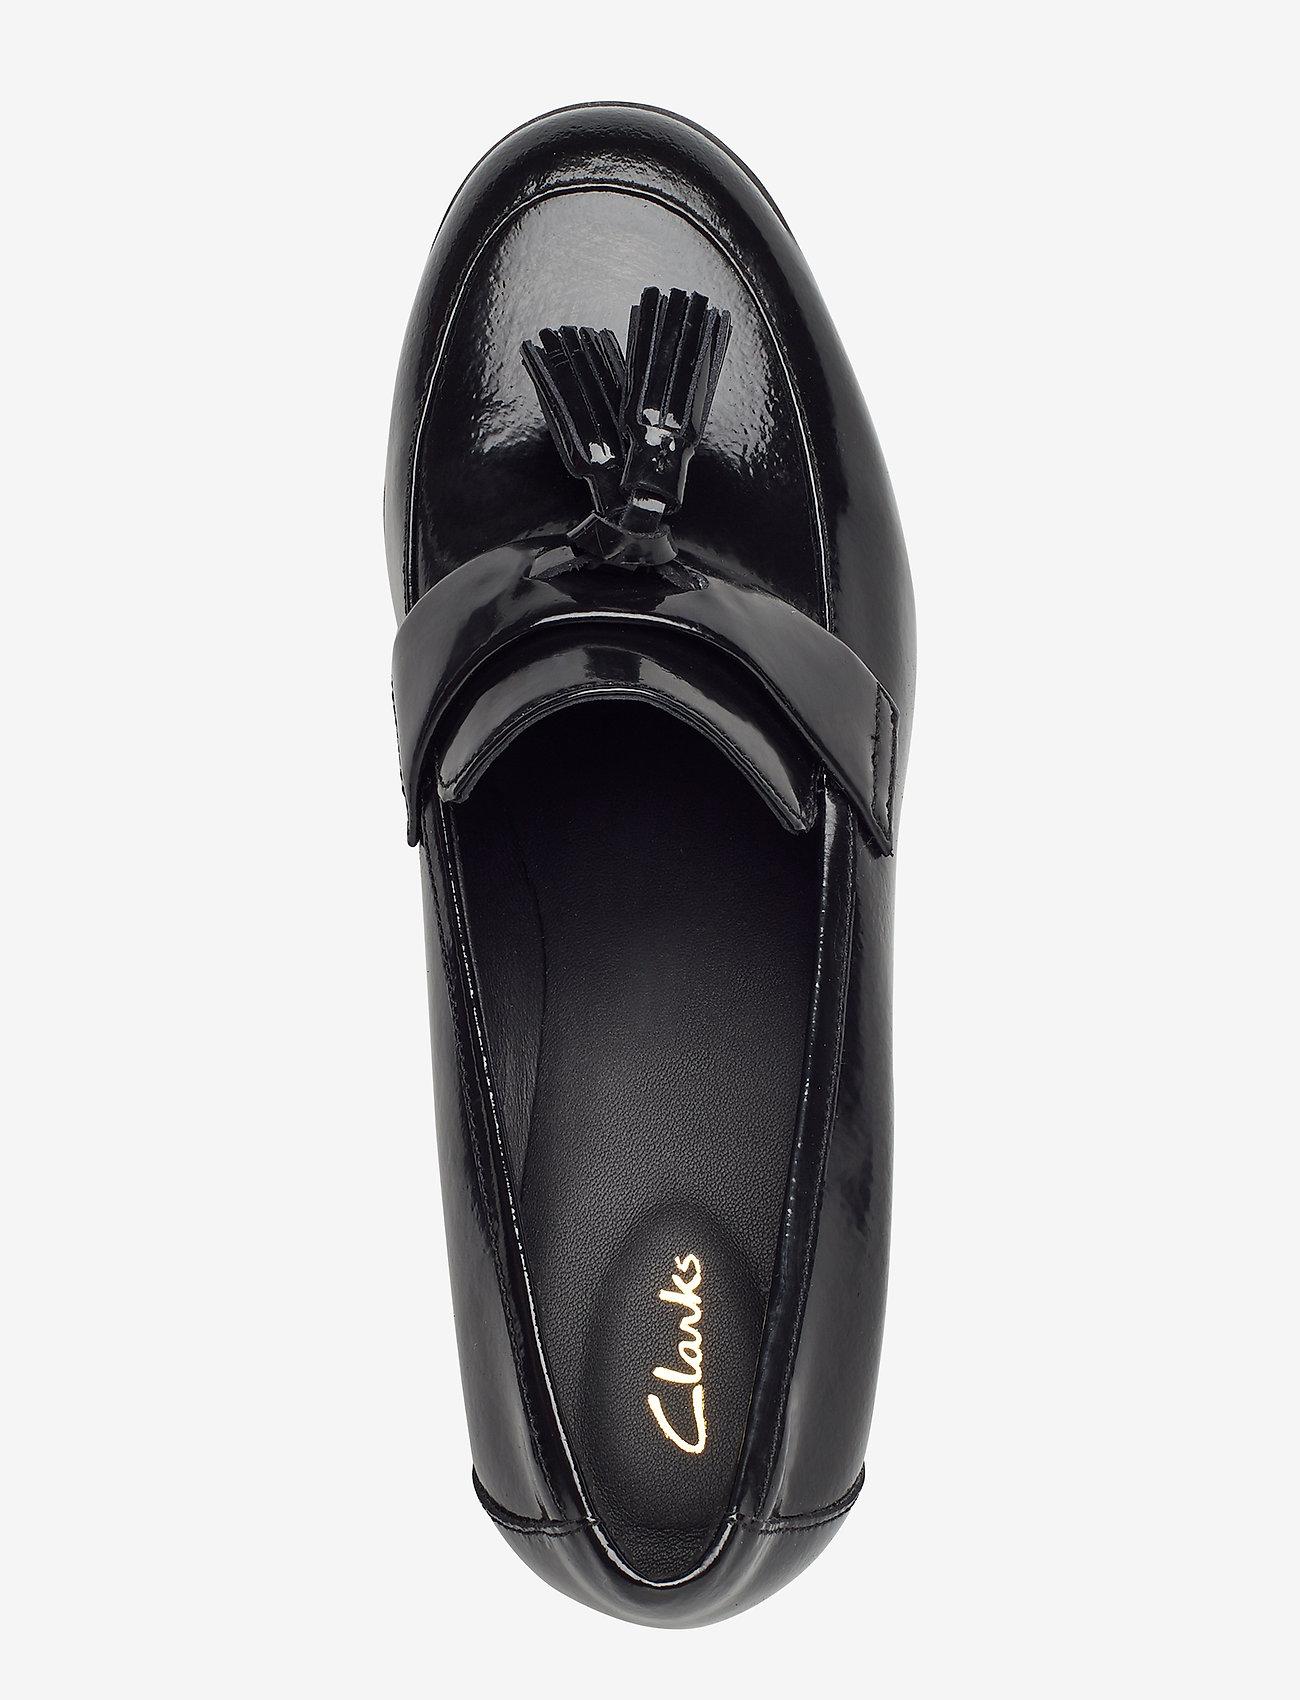 Särskild rabattRene Loafer Black Pat 899.25 Clarks OPshM zusrs